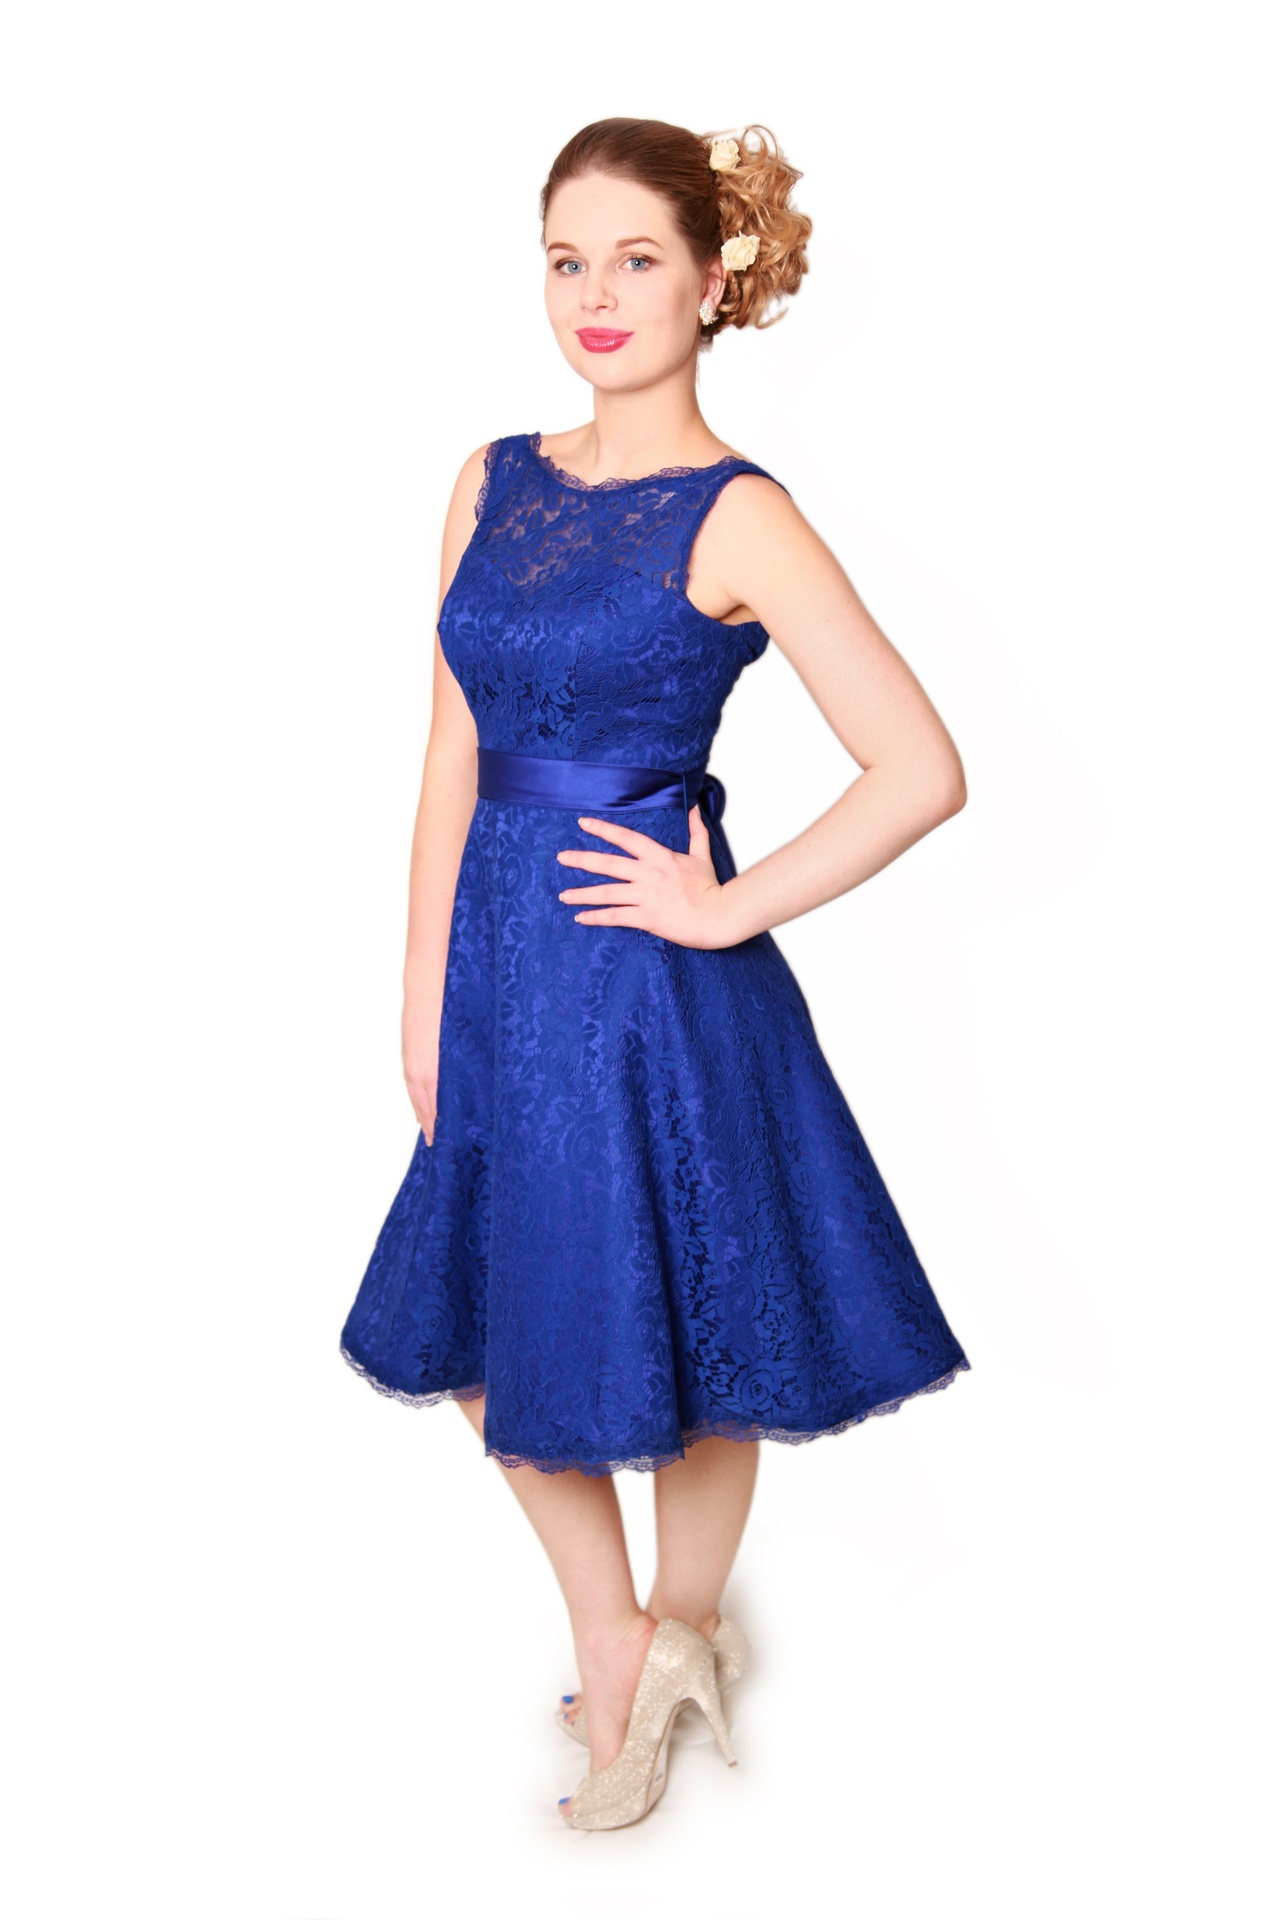 Embm01 estilo moda Wedding dress alterations cost 2018 uk